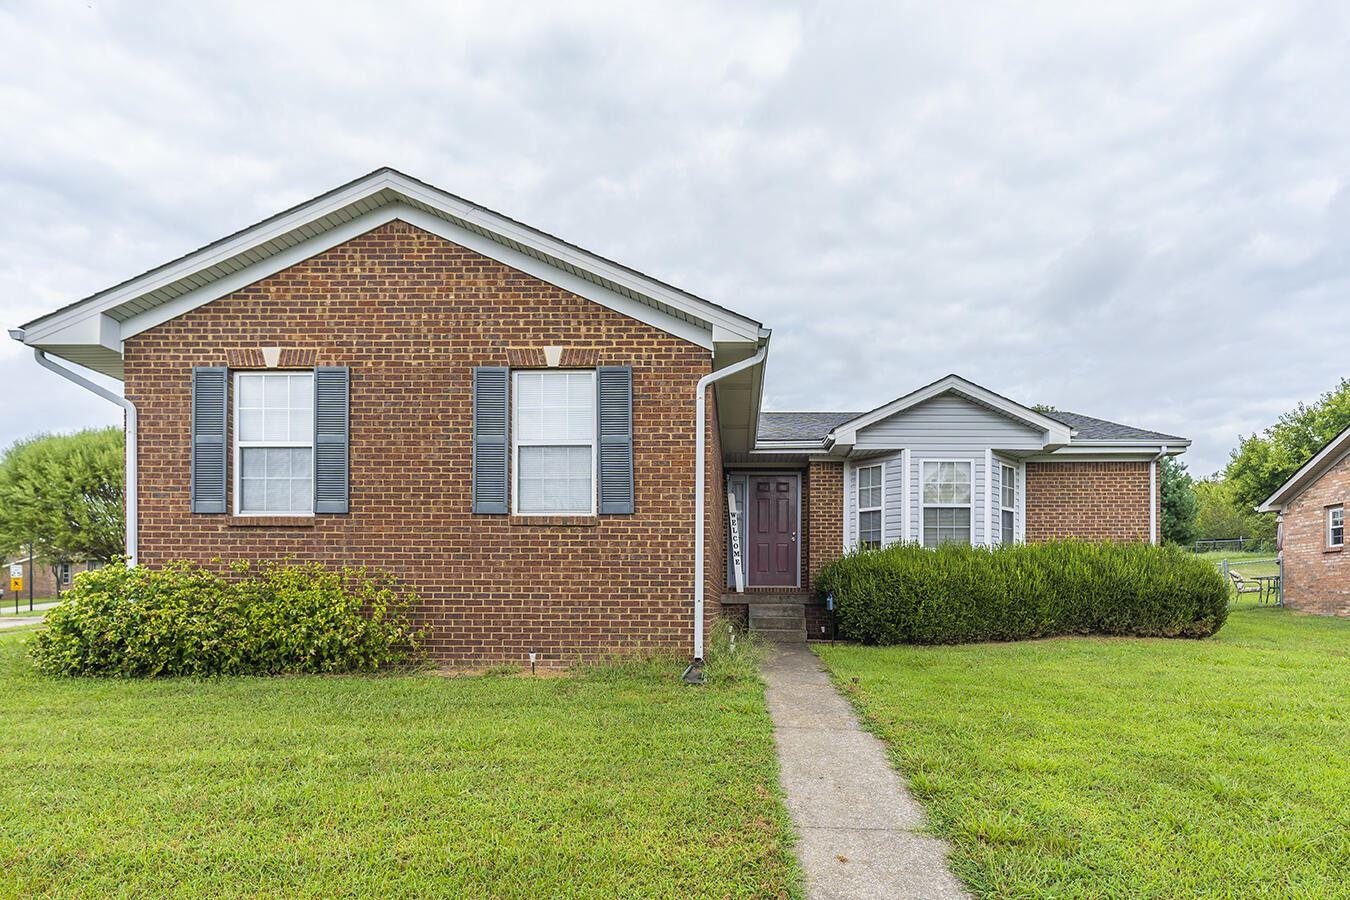 340 Michelle, Richmond, KY 40475 - MLS#: 20118688